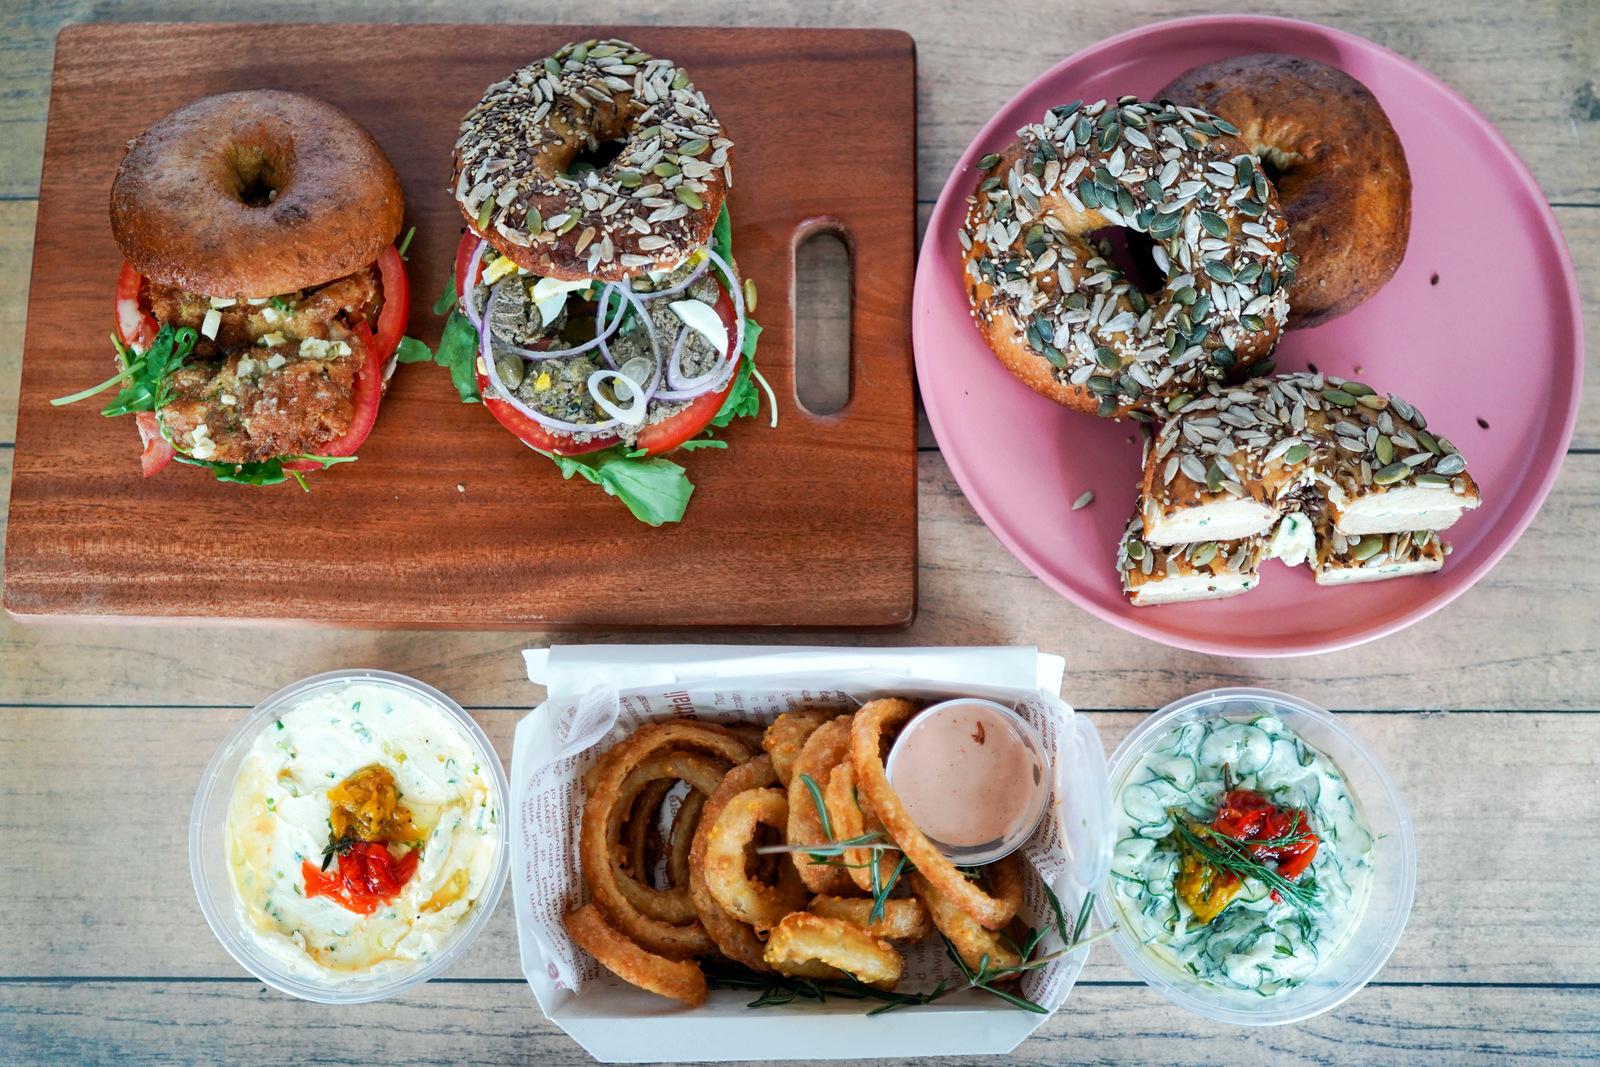 cata, bukit damansara: baking up beautiful bagels for deliveries